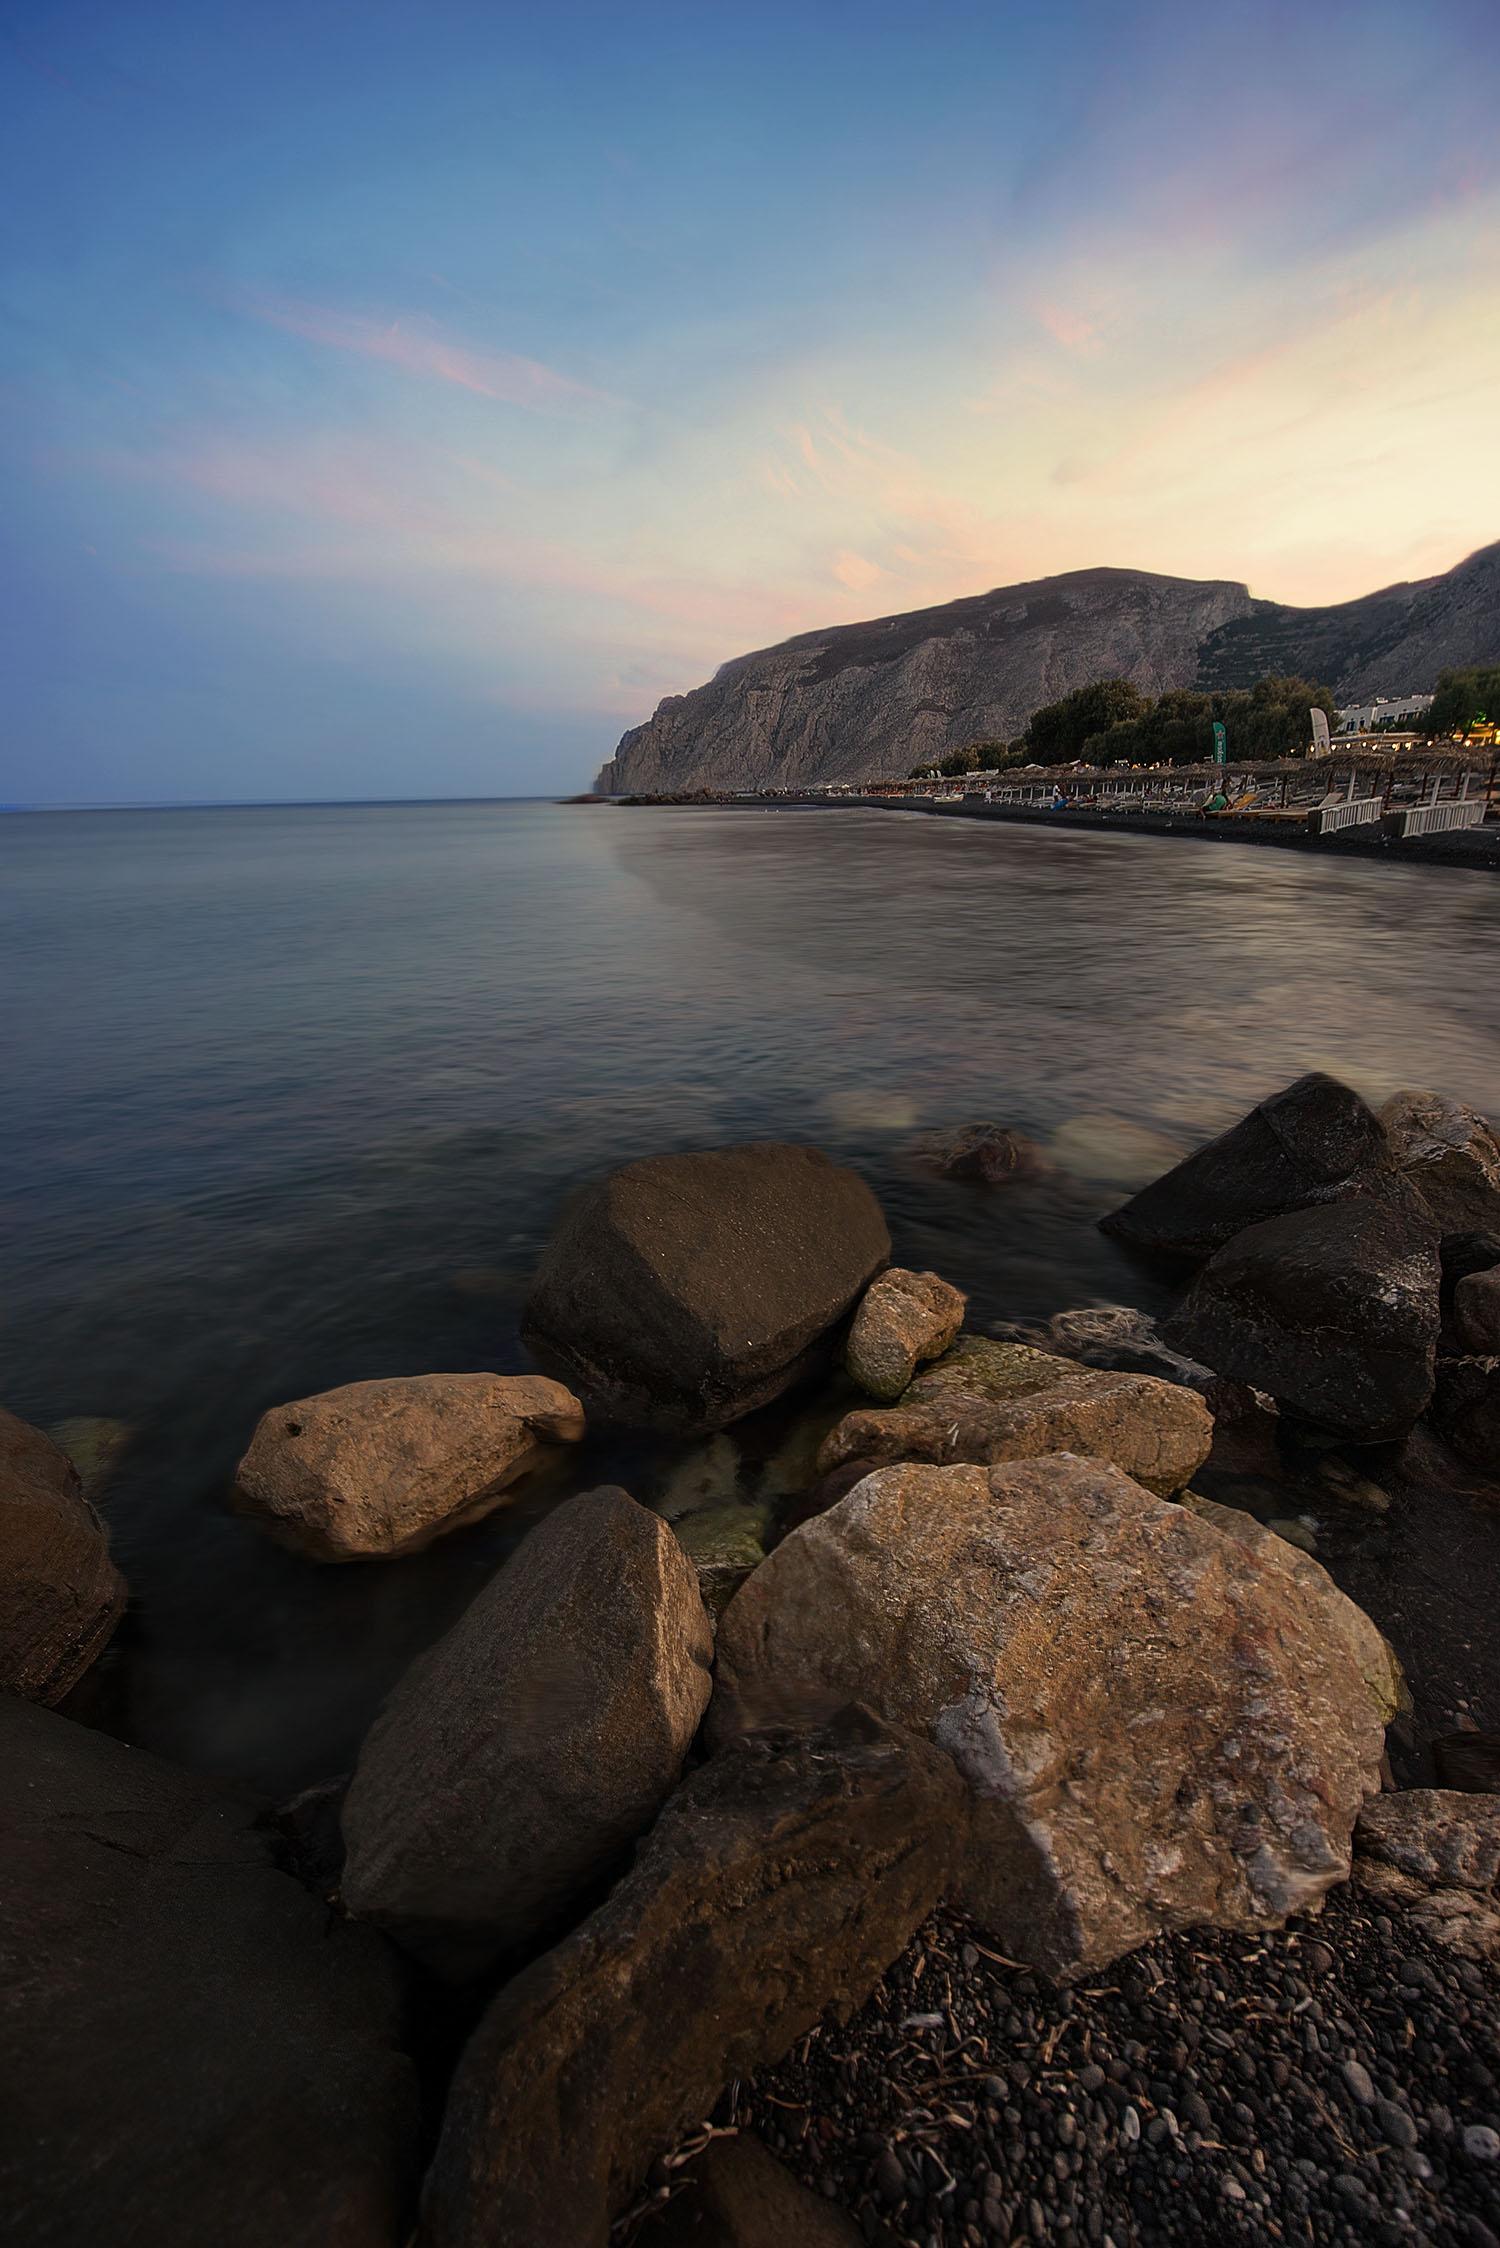 Giuseppe Sapori - The Rocks sunset